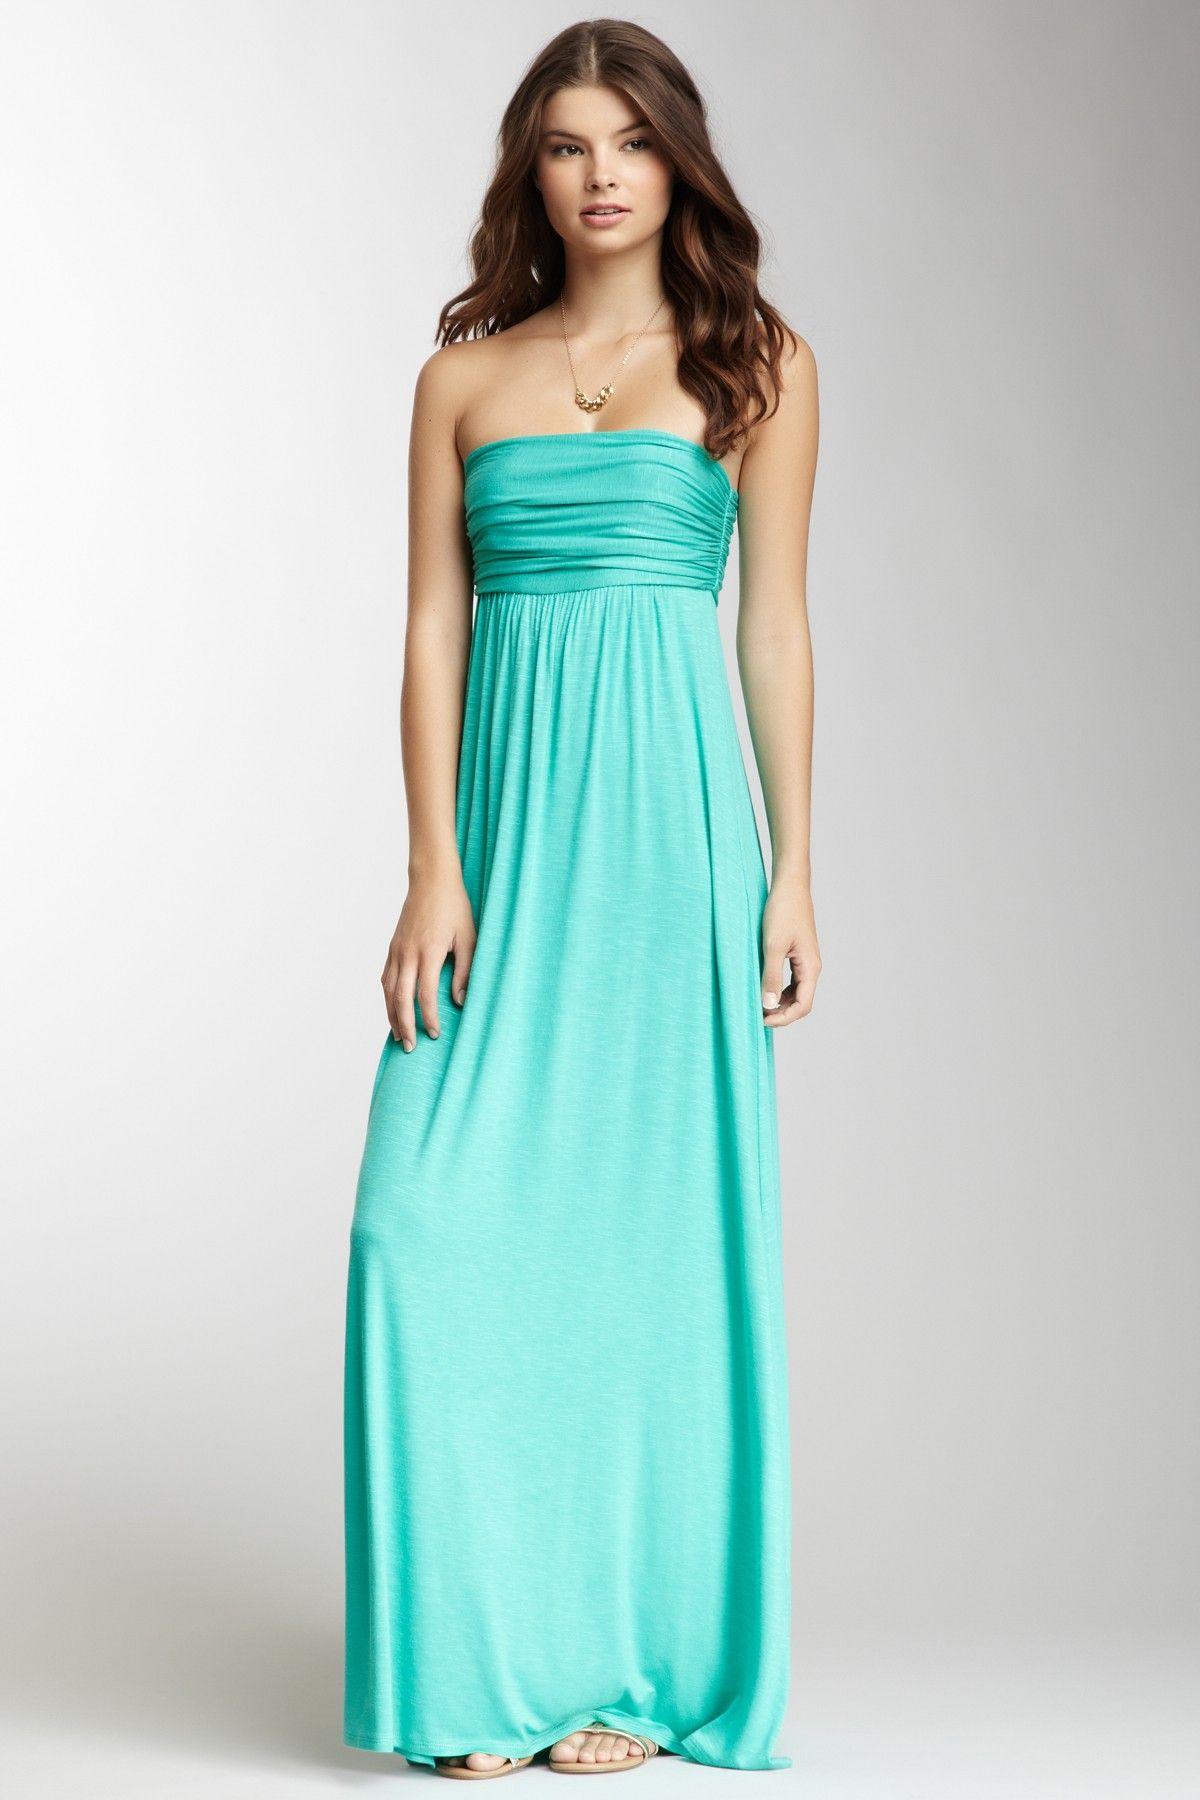 Ruched Maxi Dress | Cute Outfits | Pinterest | Maxi dresses, Clothes ...